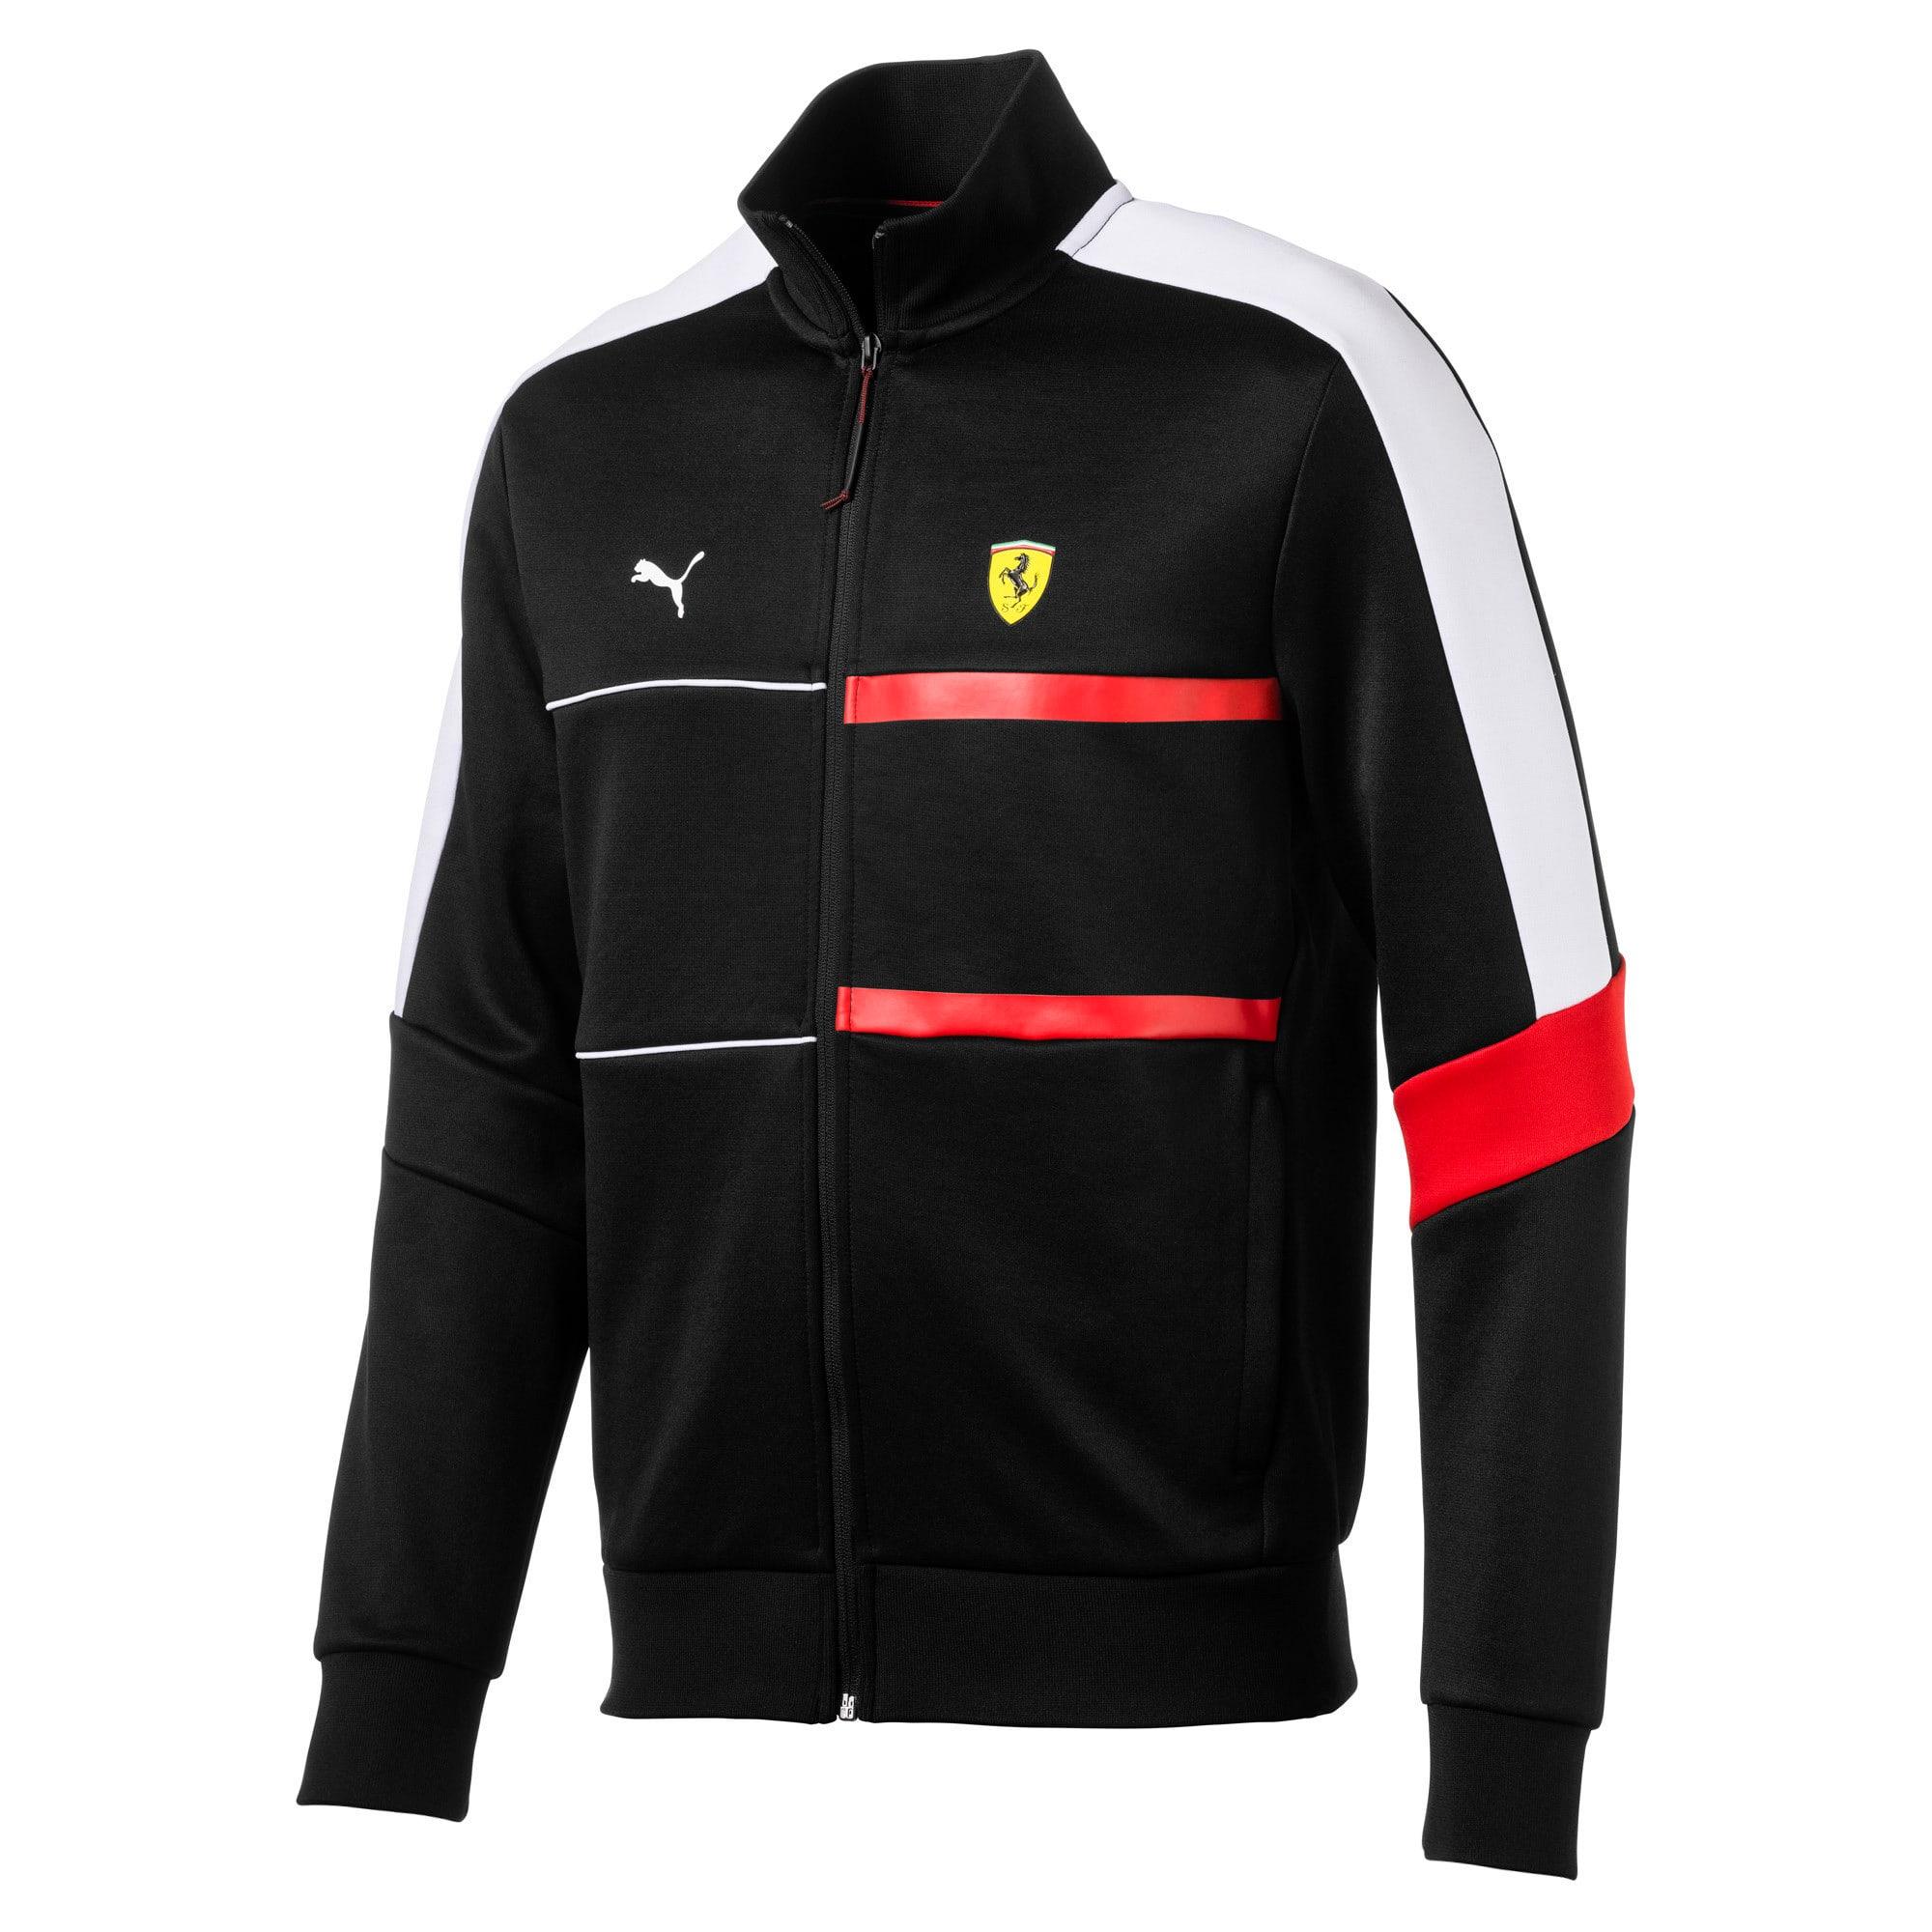 Thumbnail 2 of Scuderia Ferrari Men's T7 Track Jacket, Puma Black, medium